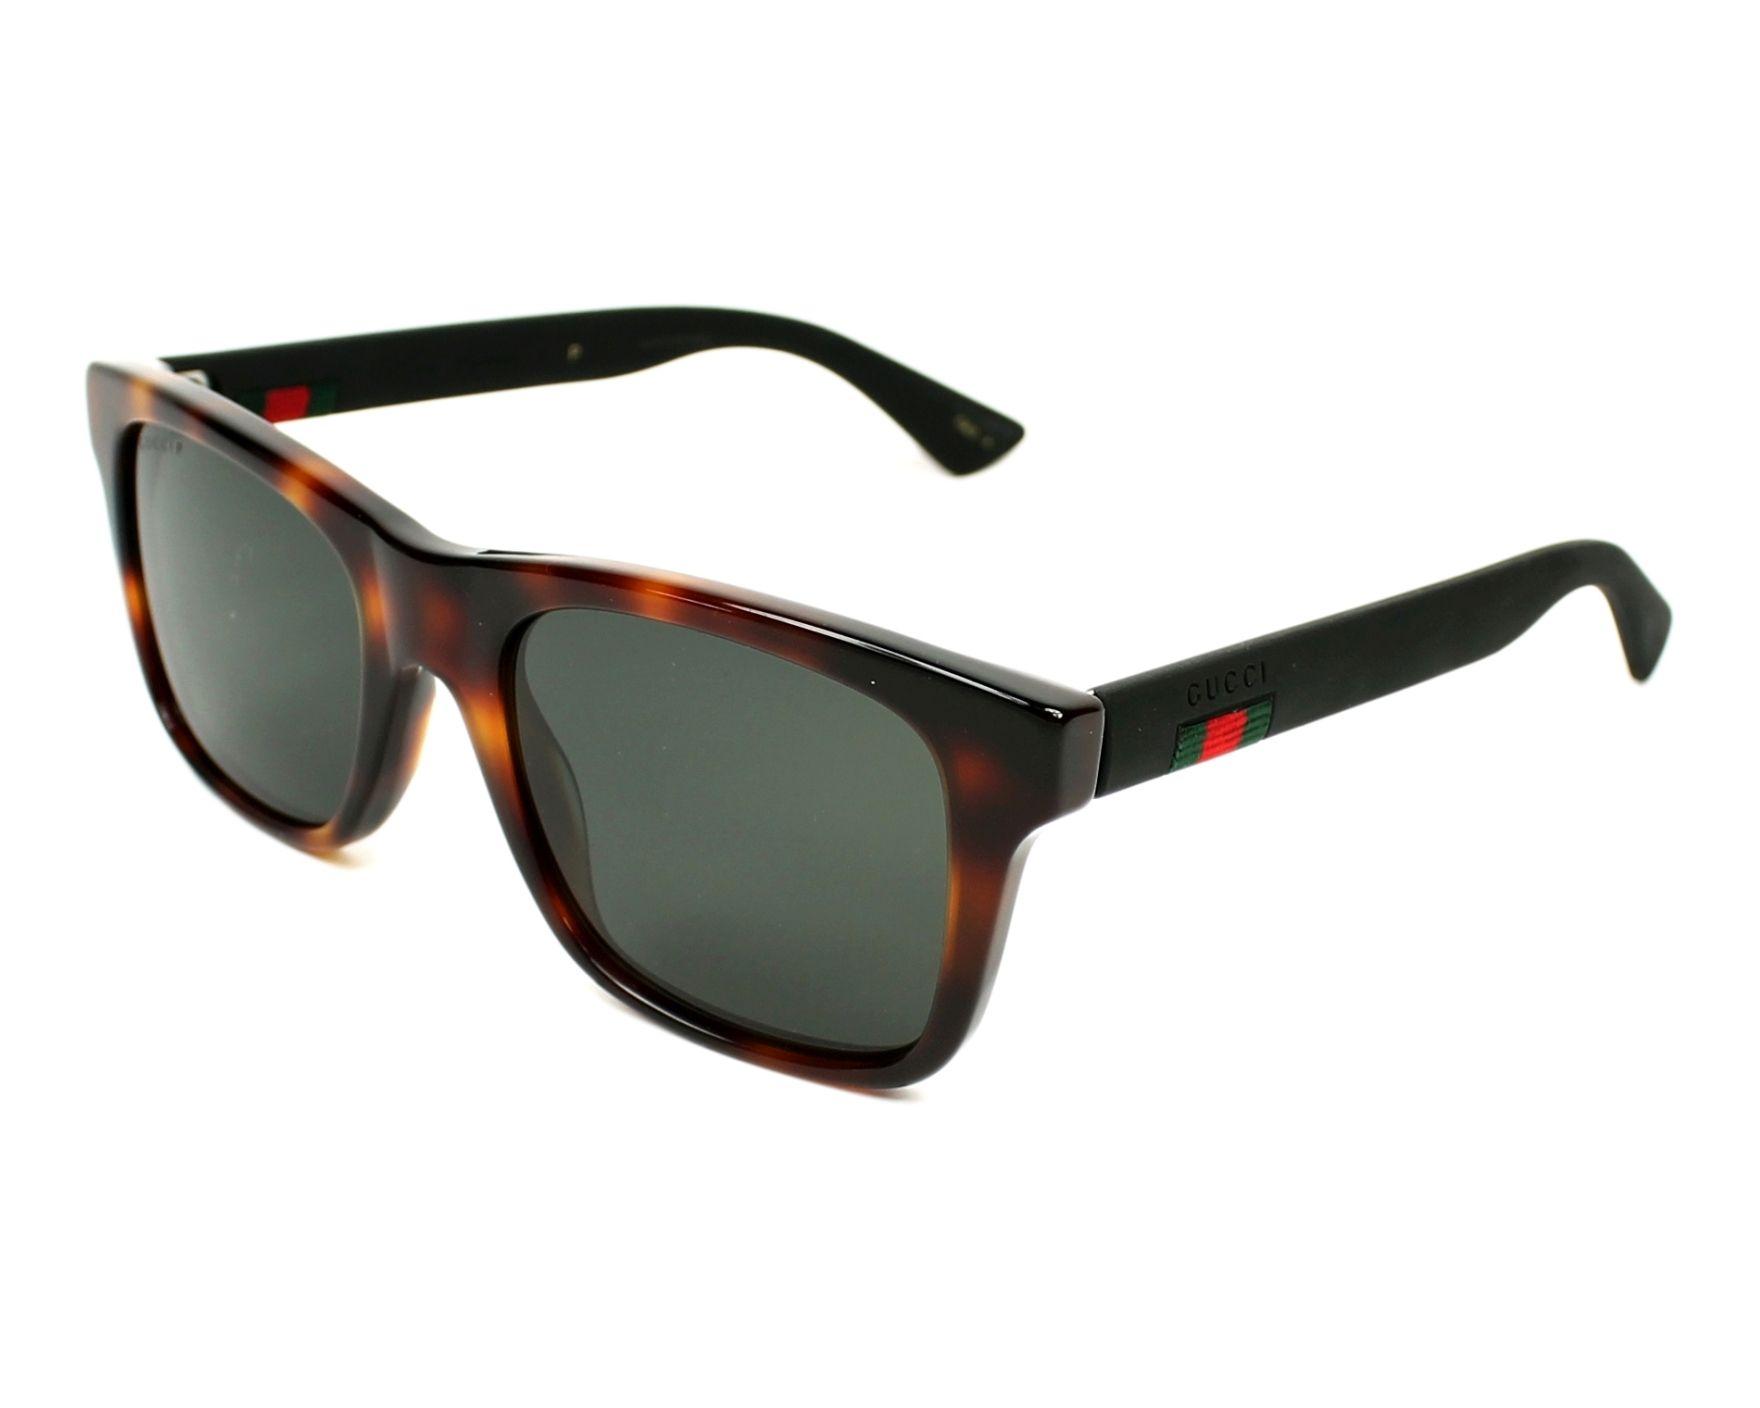 Gucci GG0008S-006 53-20 in havana/black CVbTU